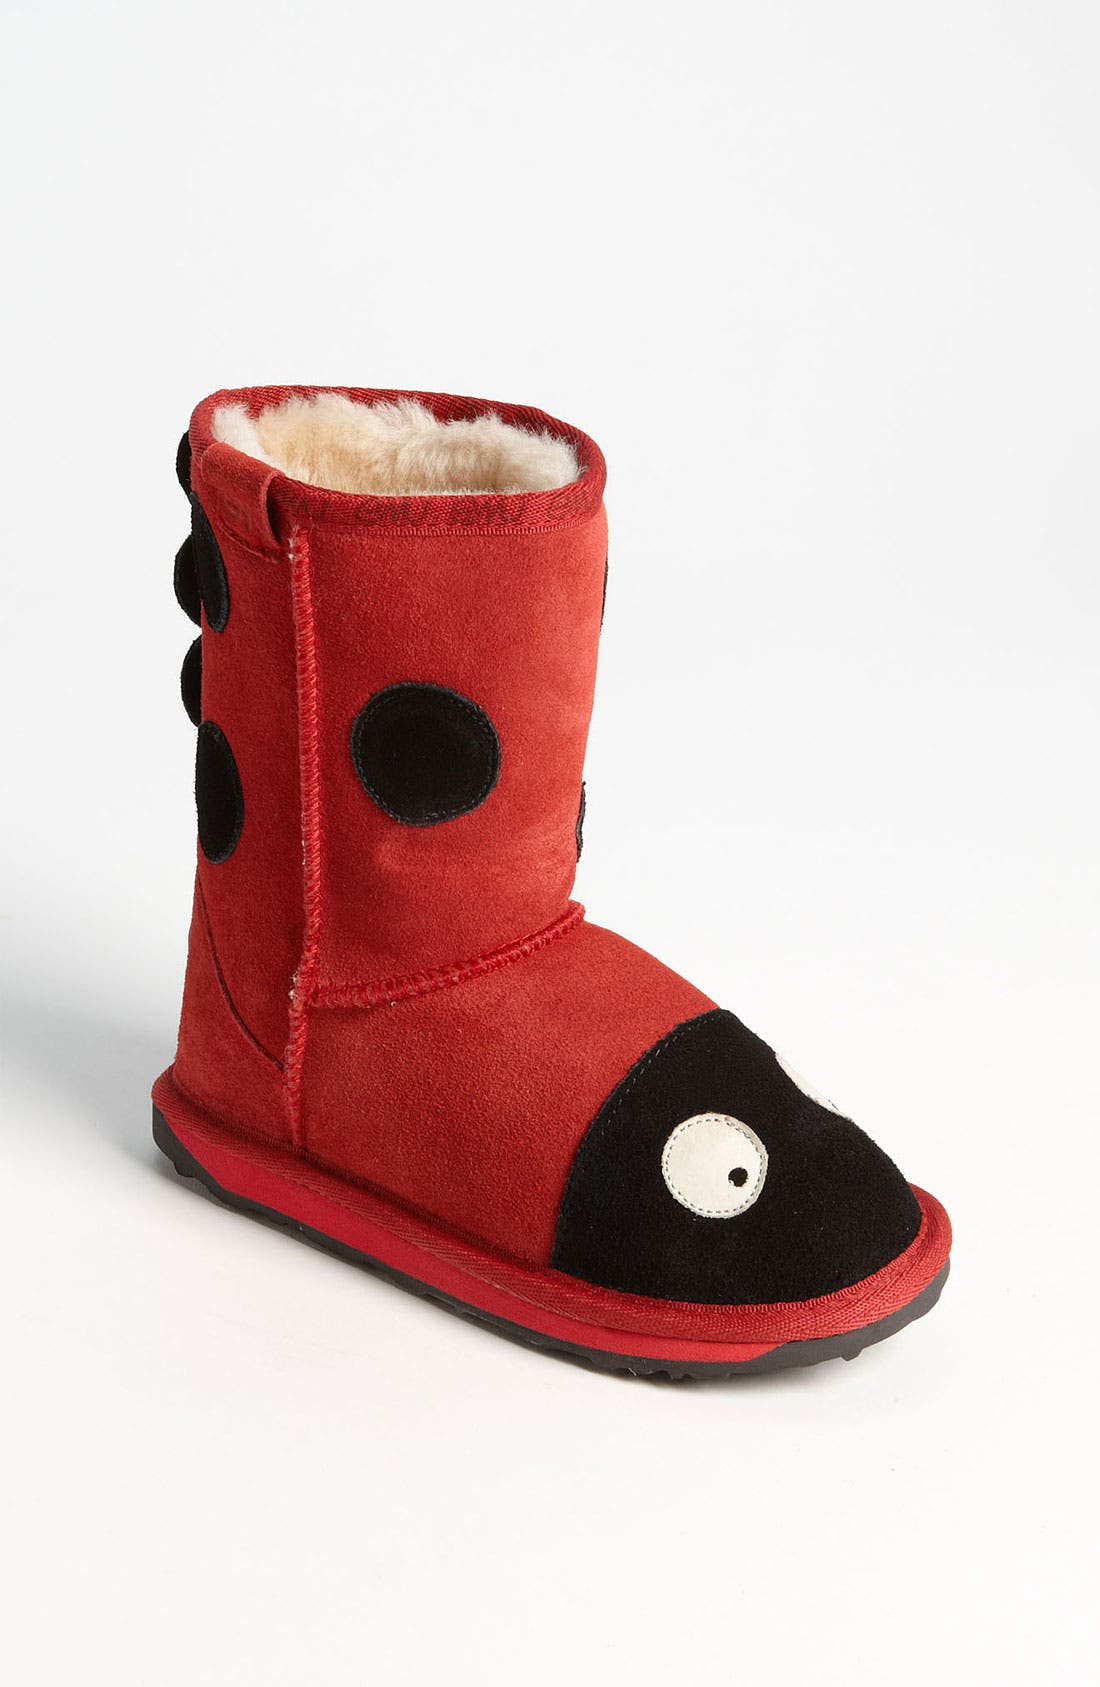 Main Image - EMU Australia 'Little Creatures - Ladybug' Boot (Toddler, Little Kid & Big Kid)